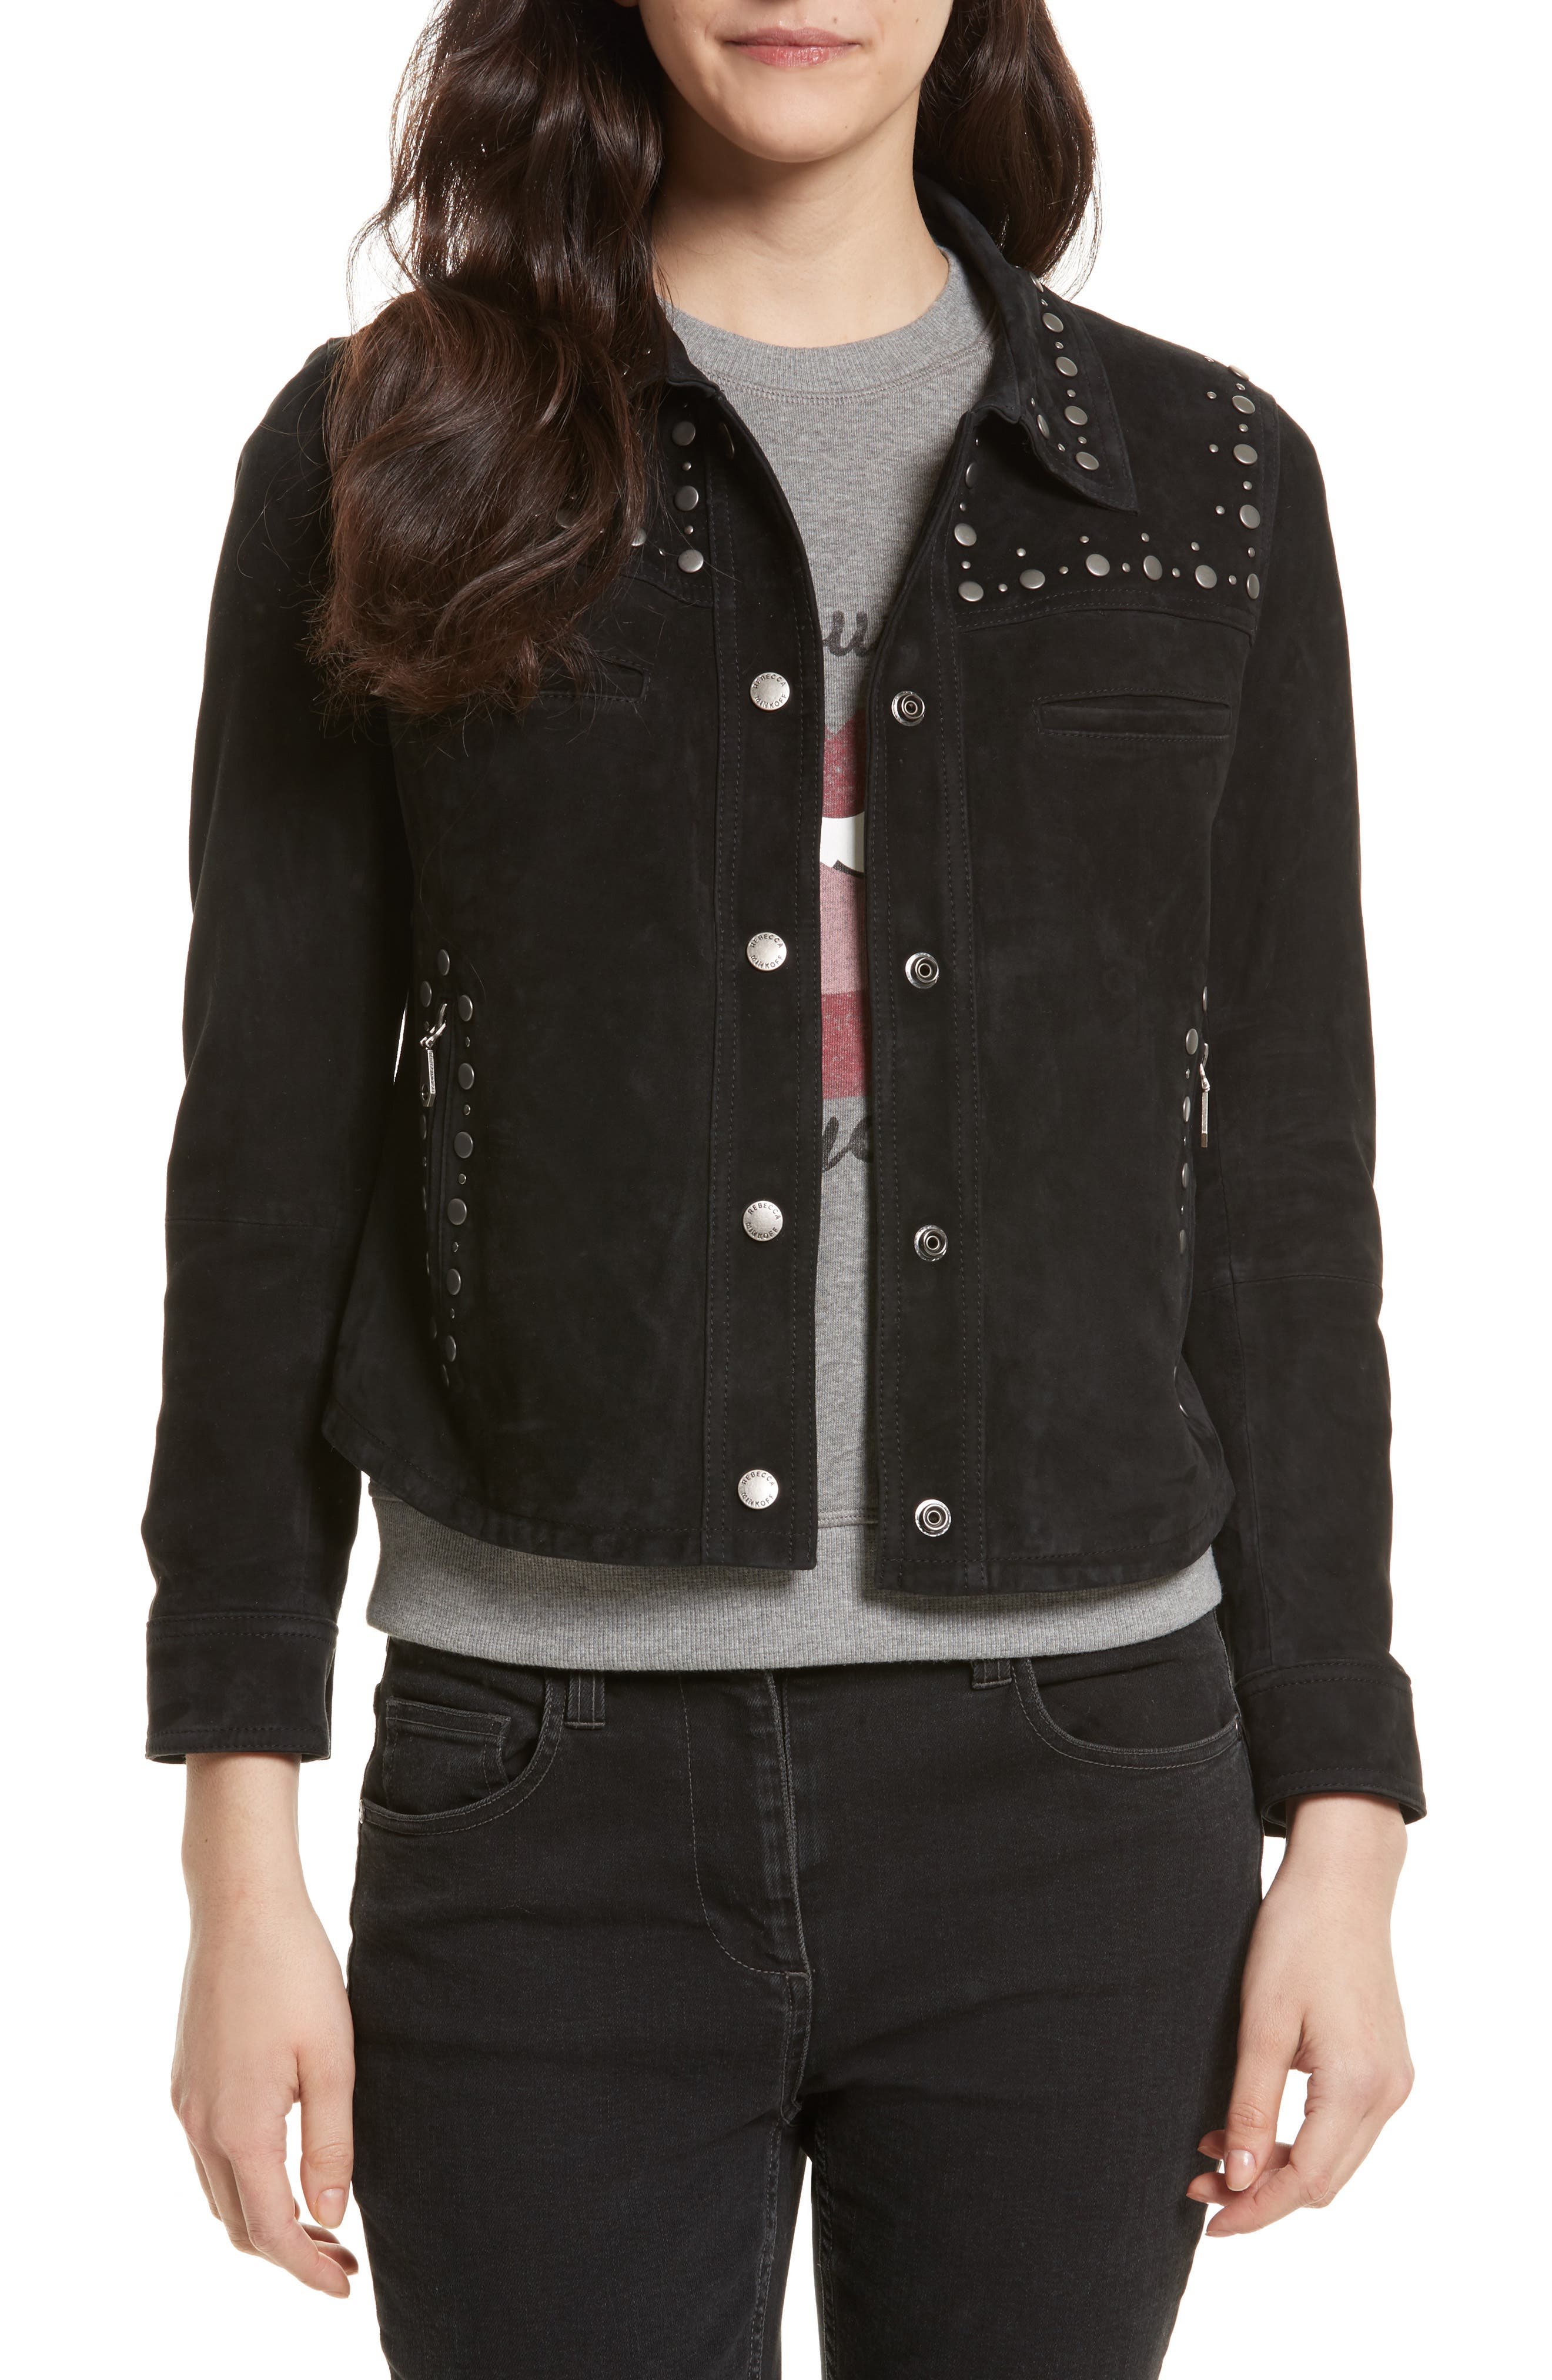 Rebecca Minkoff Herring Studded Suede Jacket